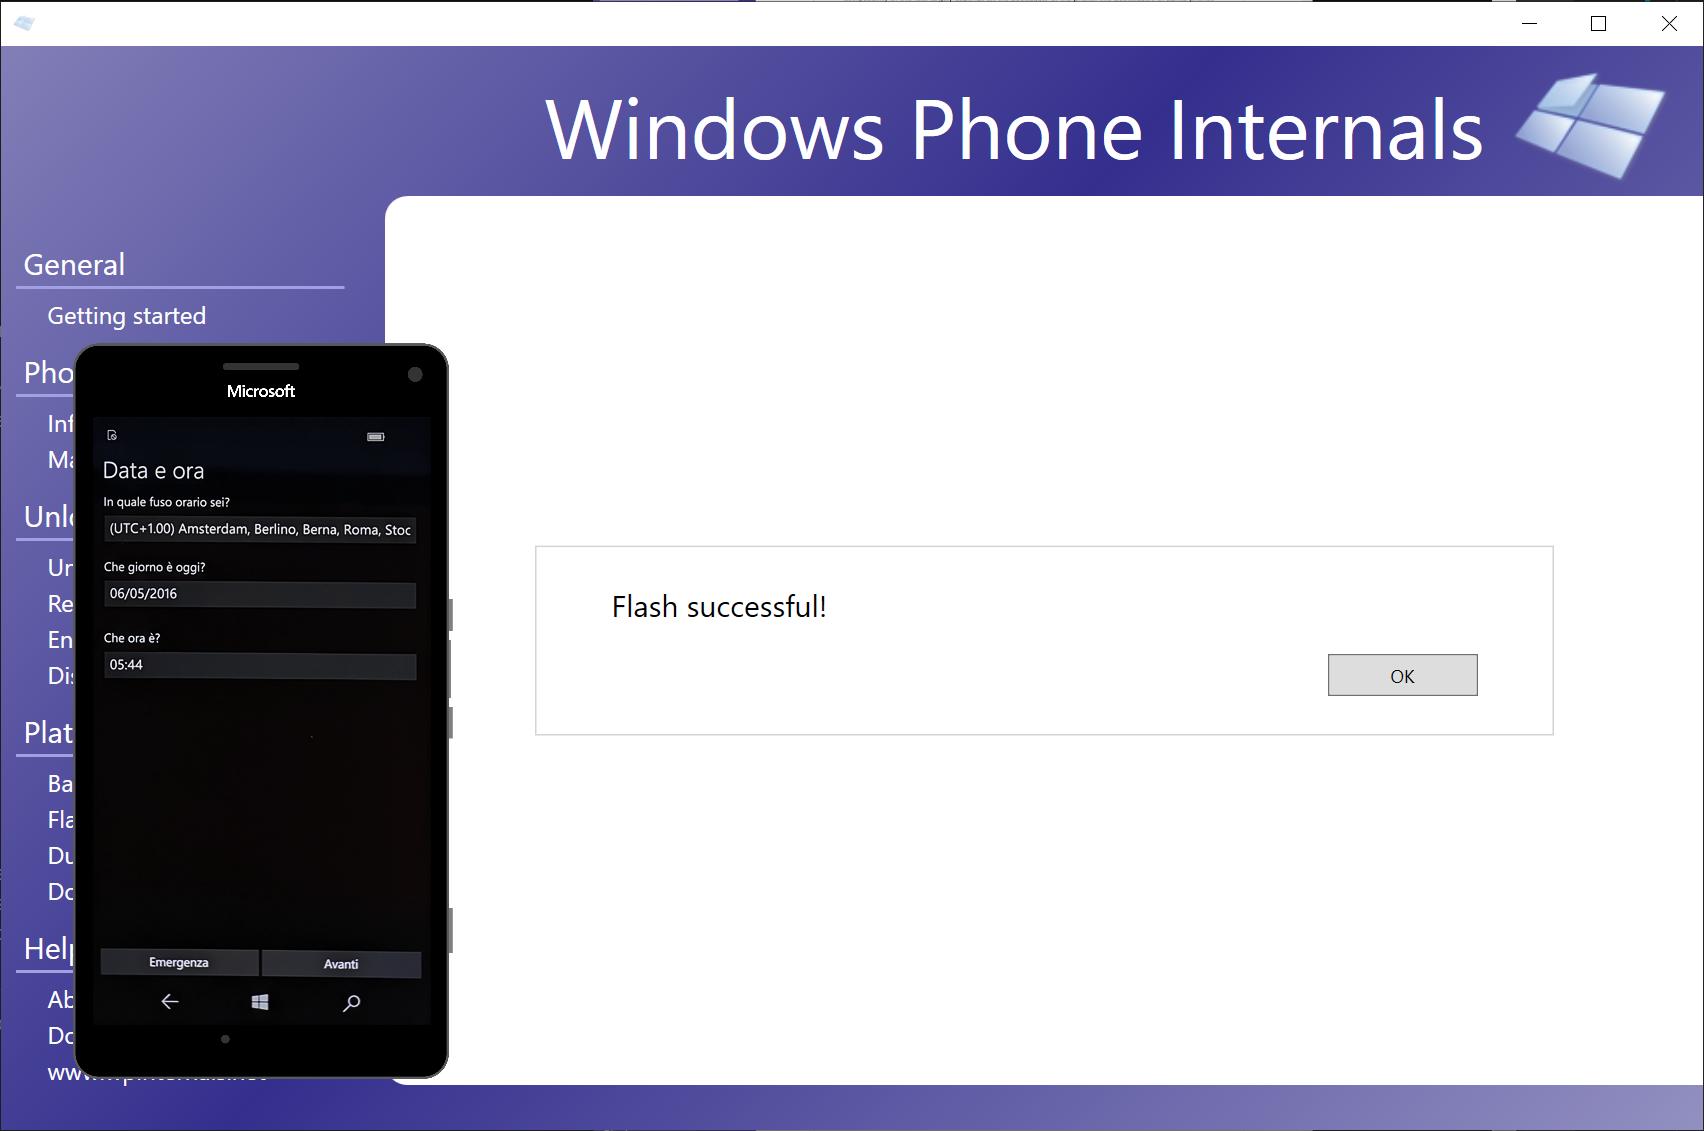 WPInternals has completed the flash procedure